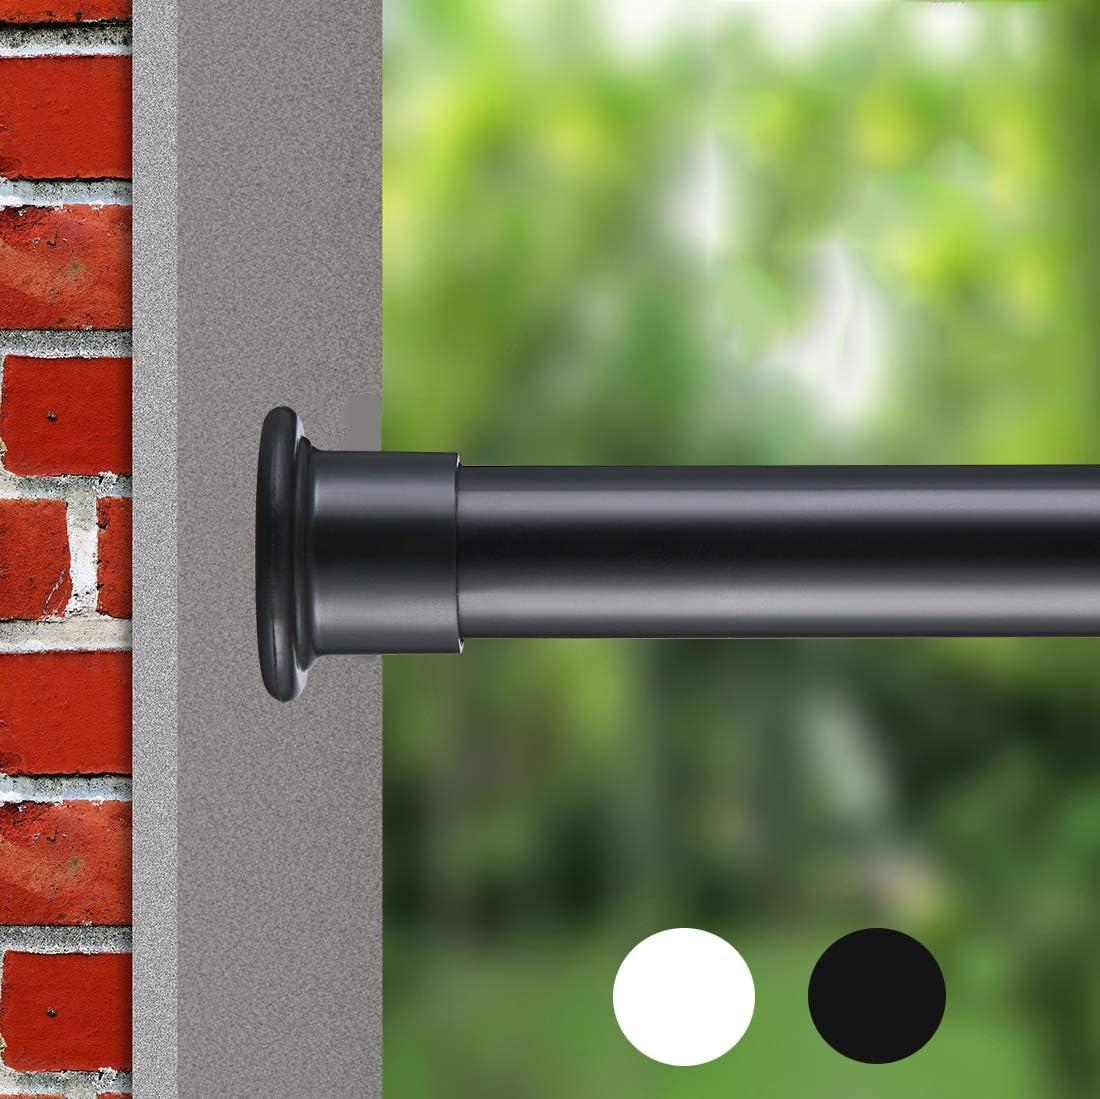 allzone spring shower tension curtain rod for shower room doorway wardrobe steel no drilling rust free 28 41 black